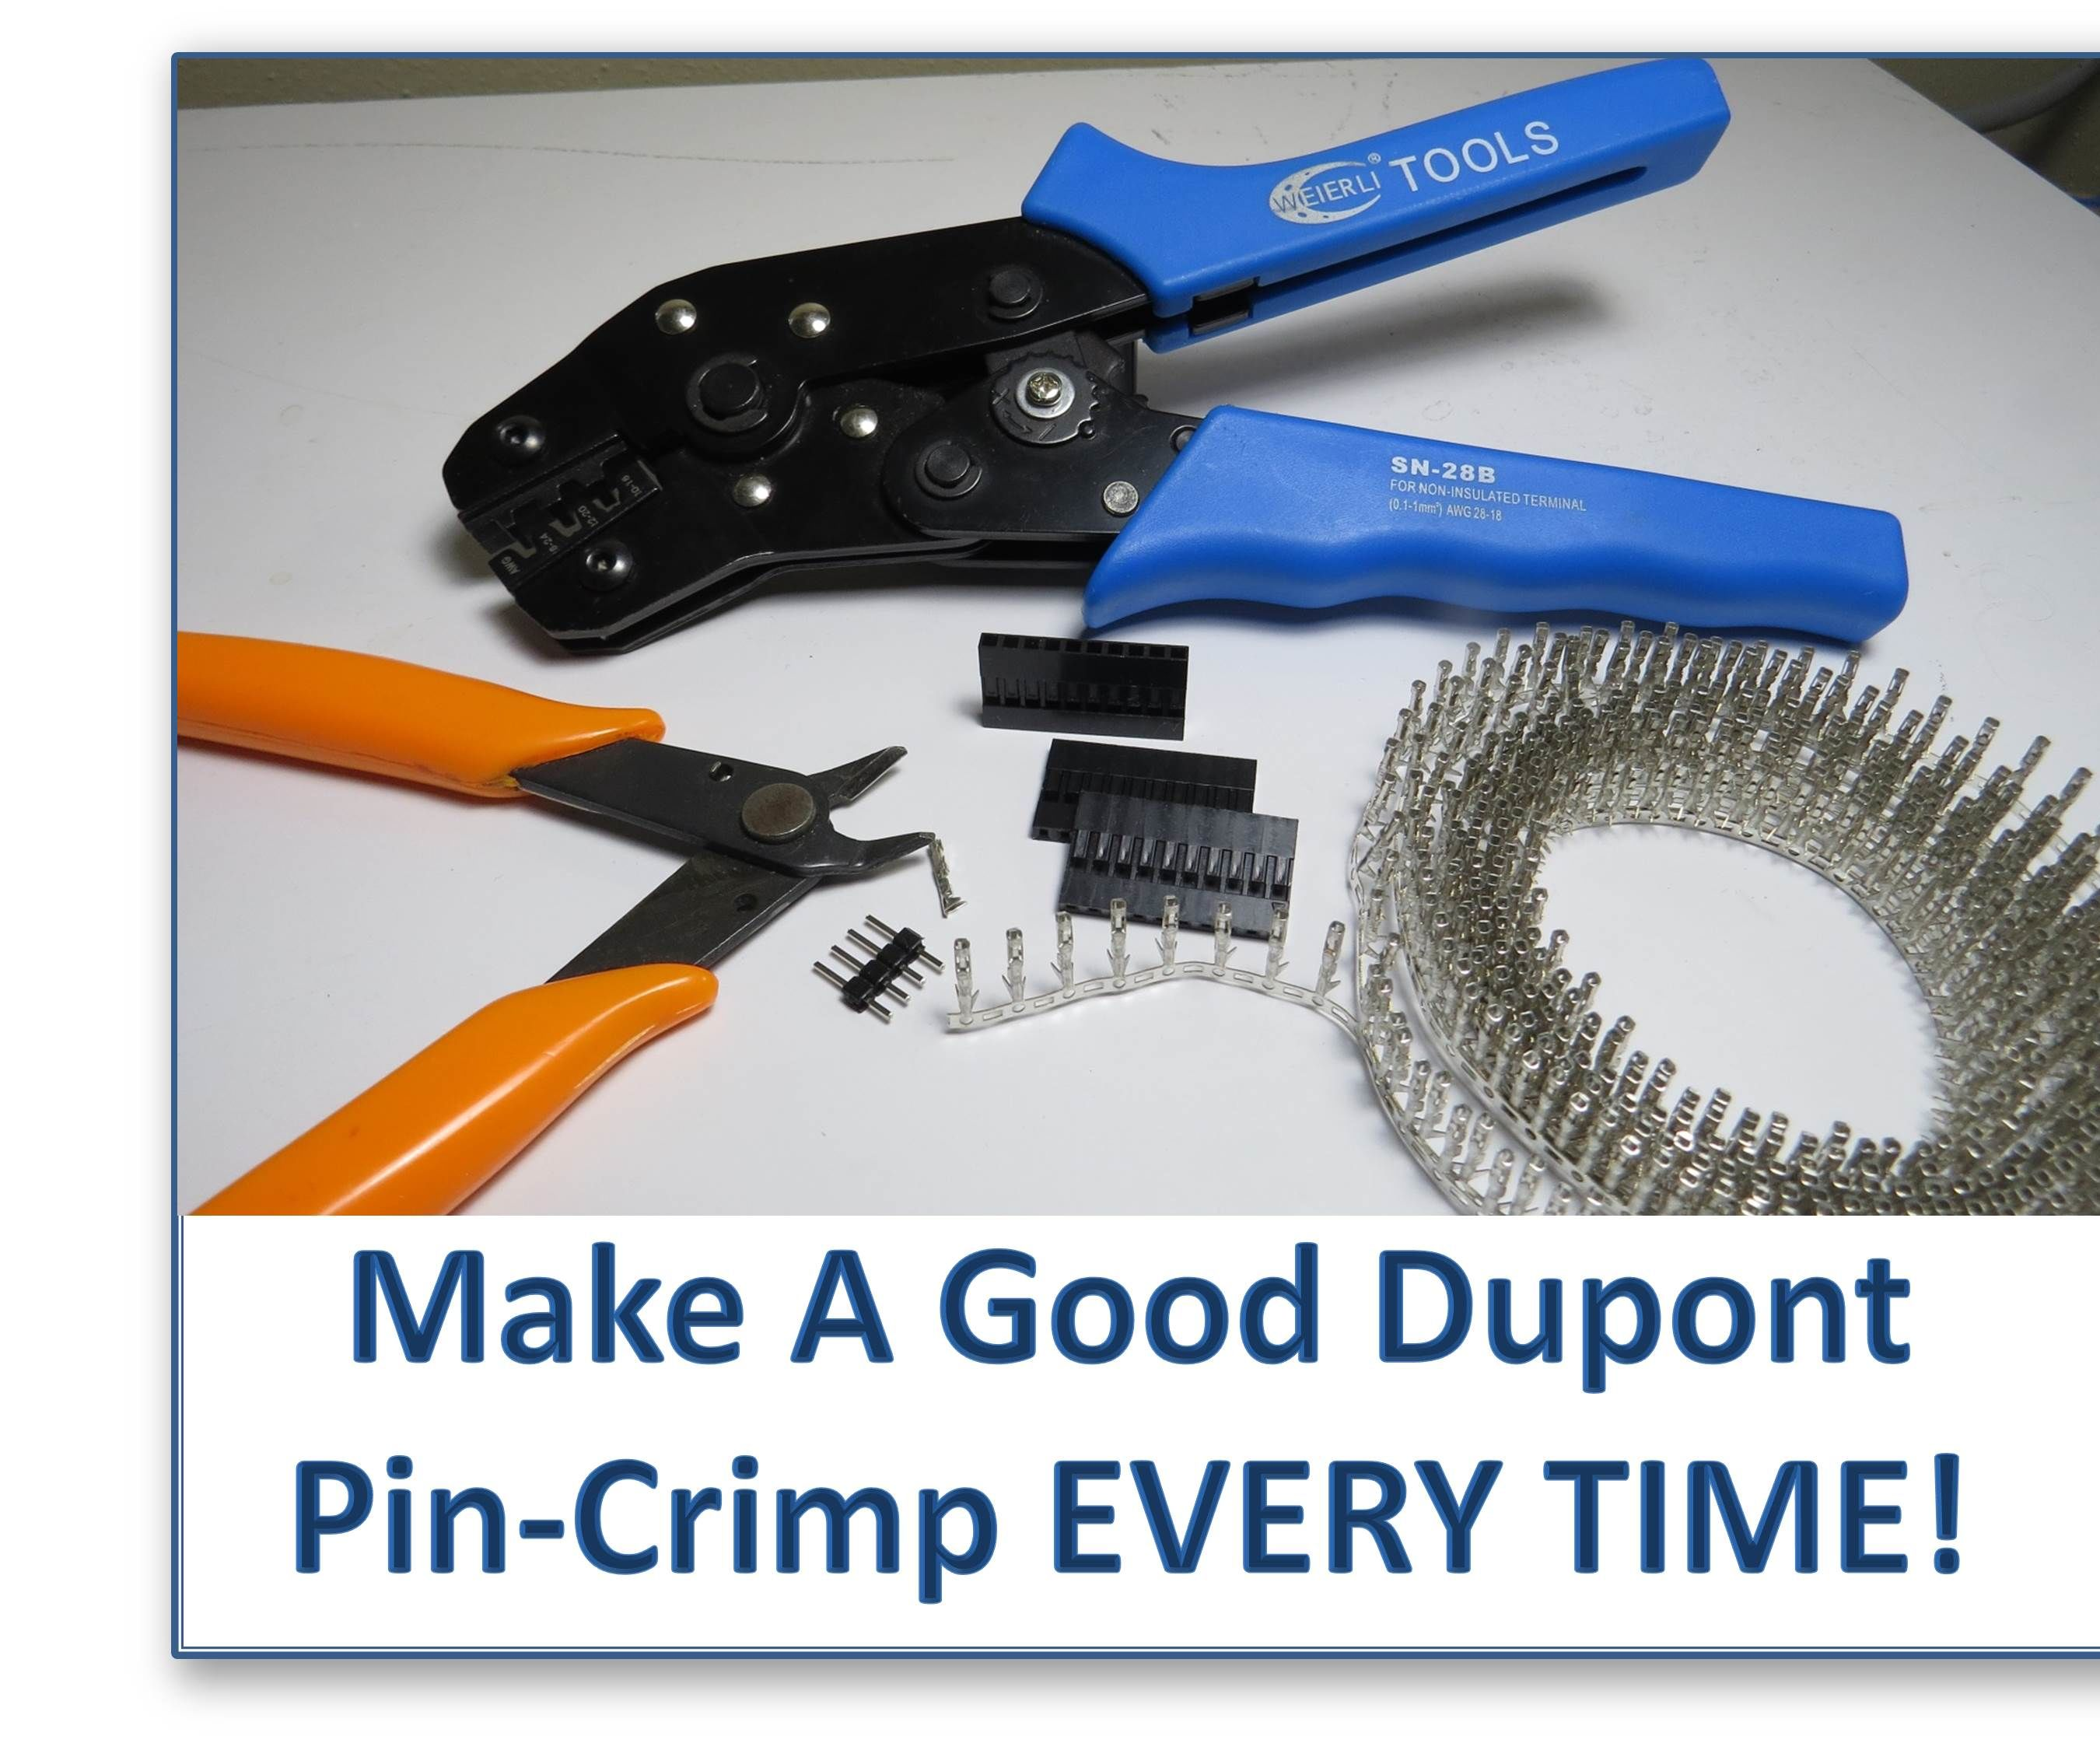 medium resolution of make a good dupont pin crimp every time